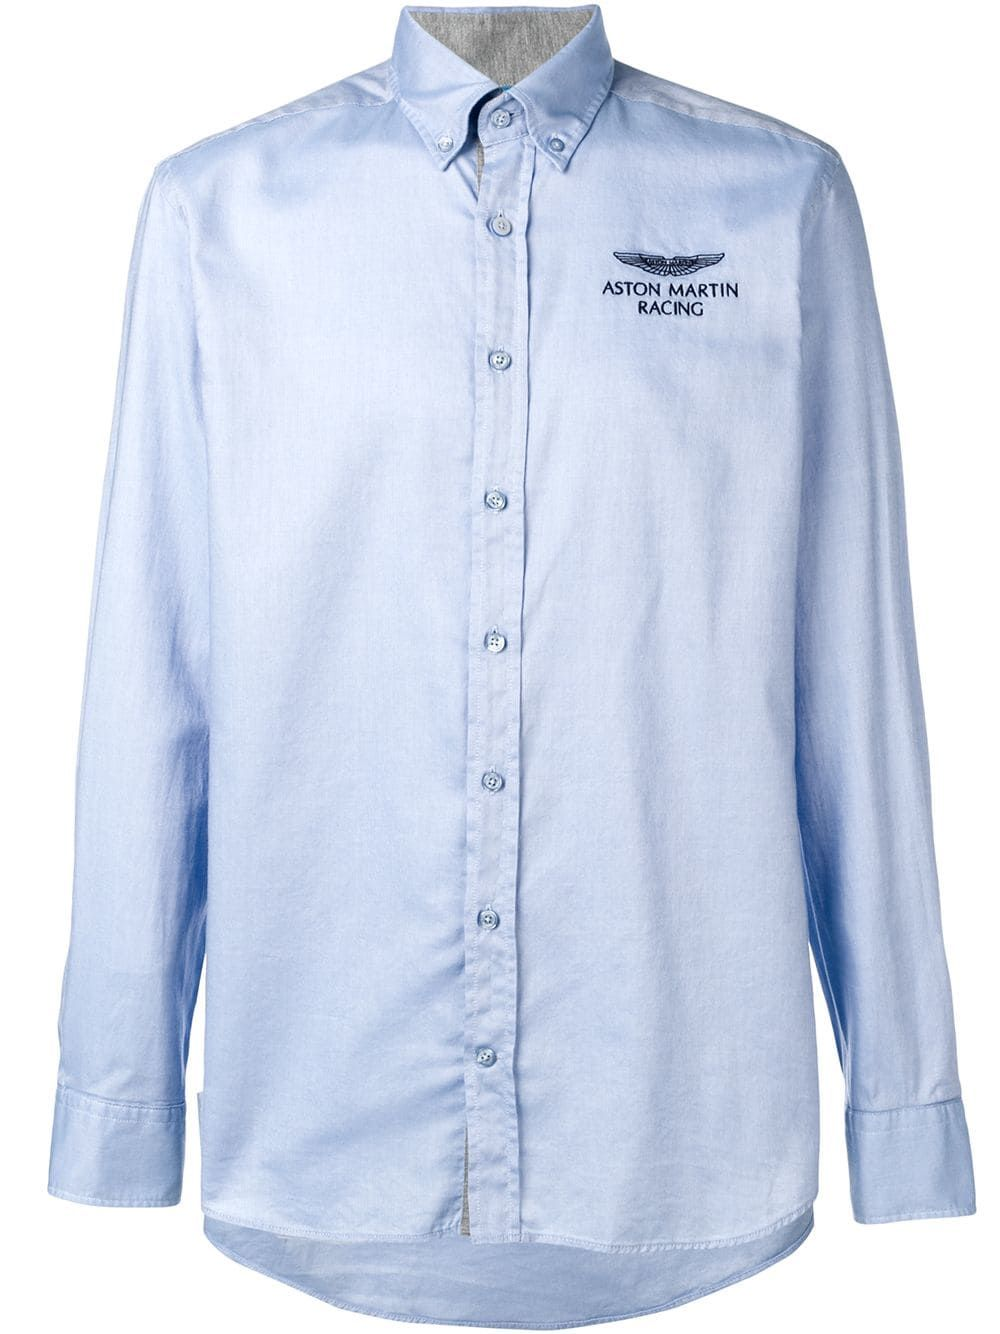 Hackett X Aston Martin Racing Shirt In Blue Modesens Racing Shirts Shirts Oxford Shirt